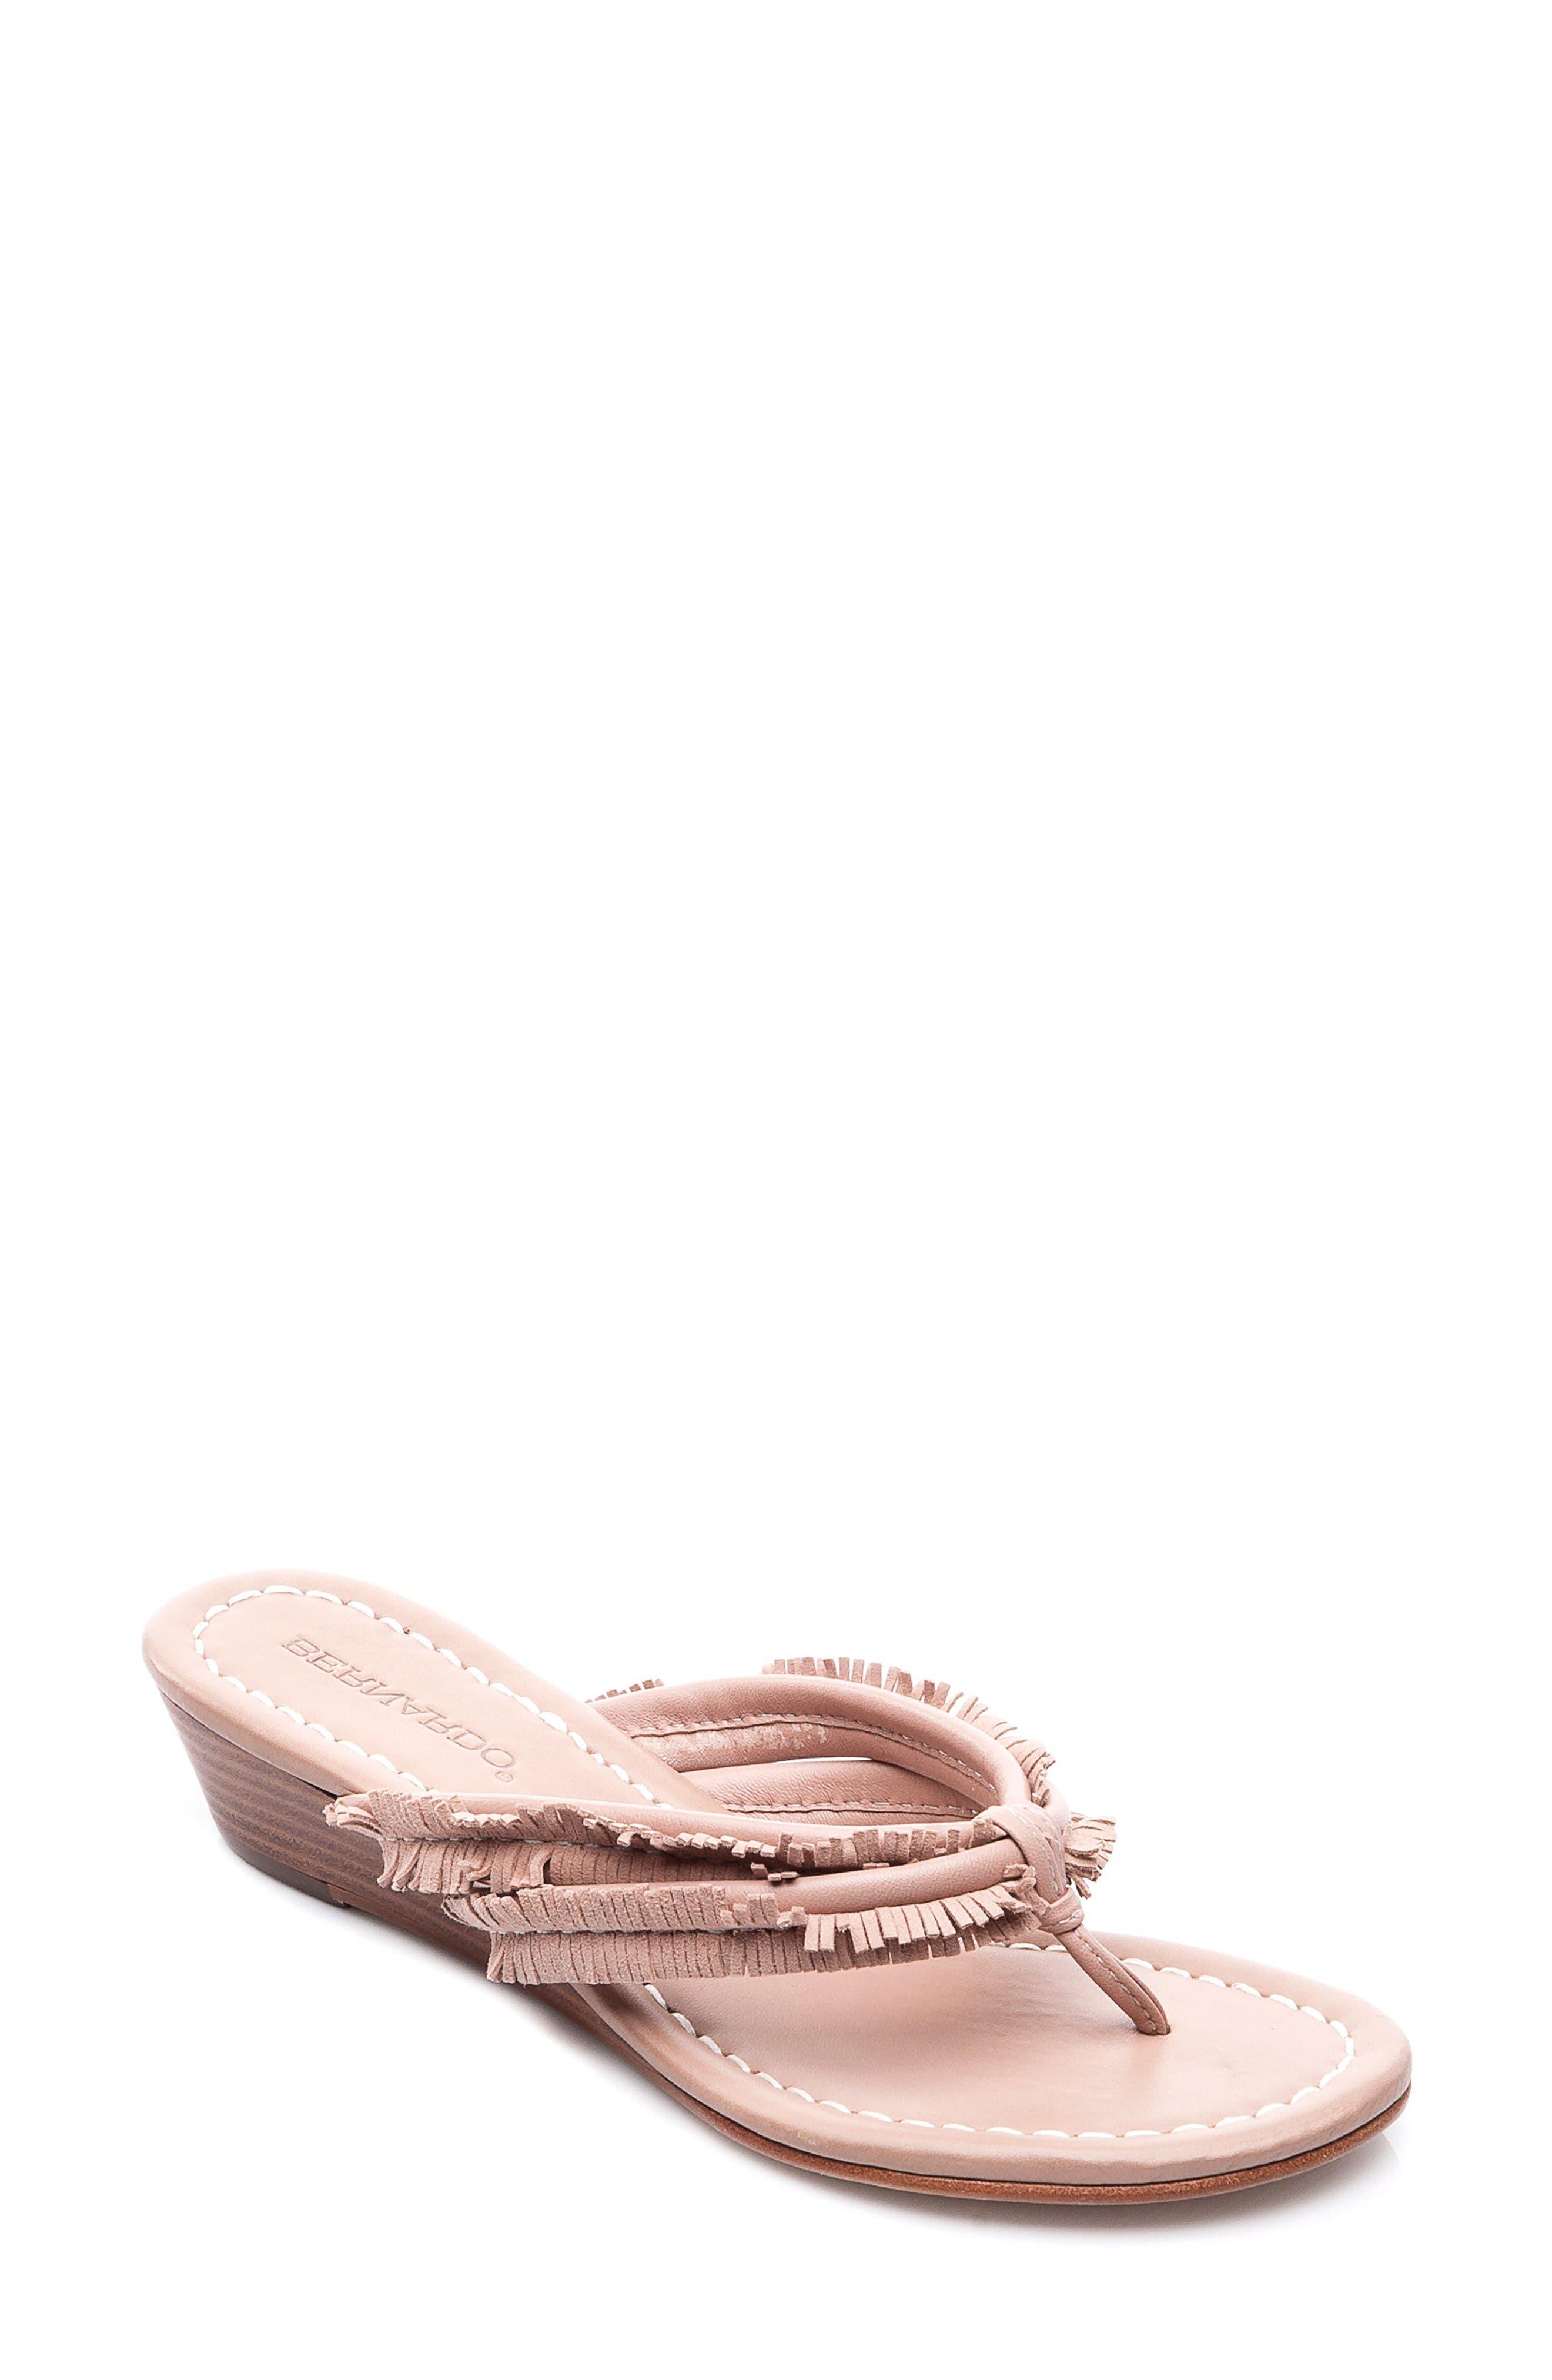 Bernardo Miami Wedge Sandal (Women)